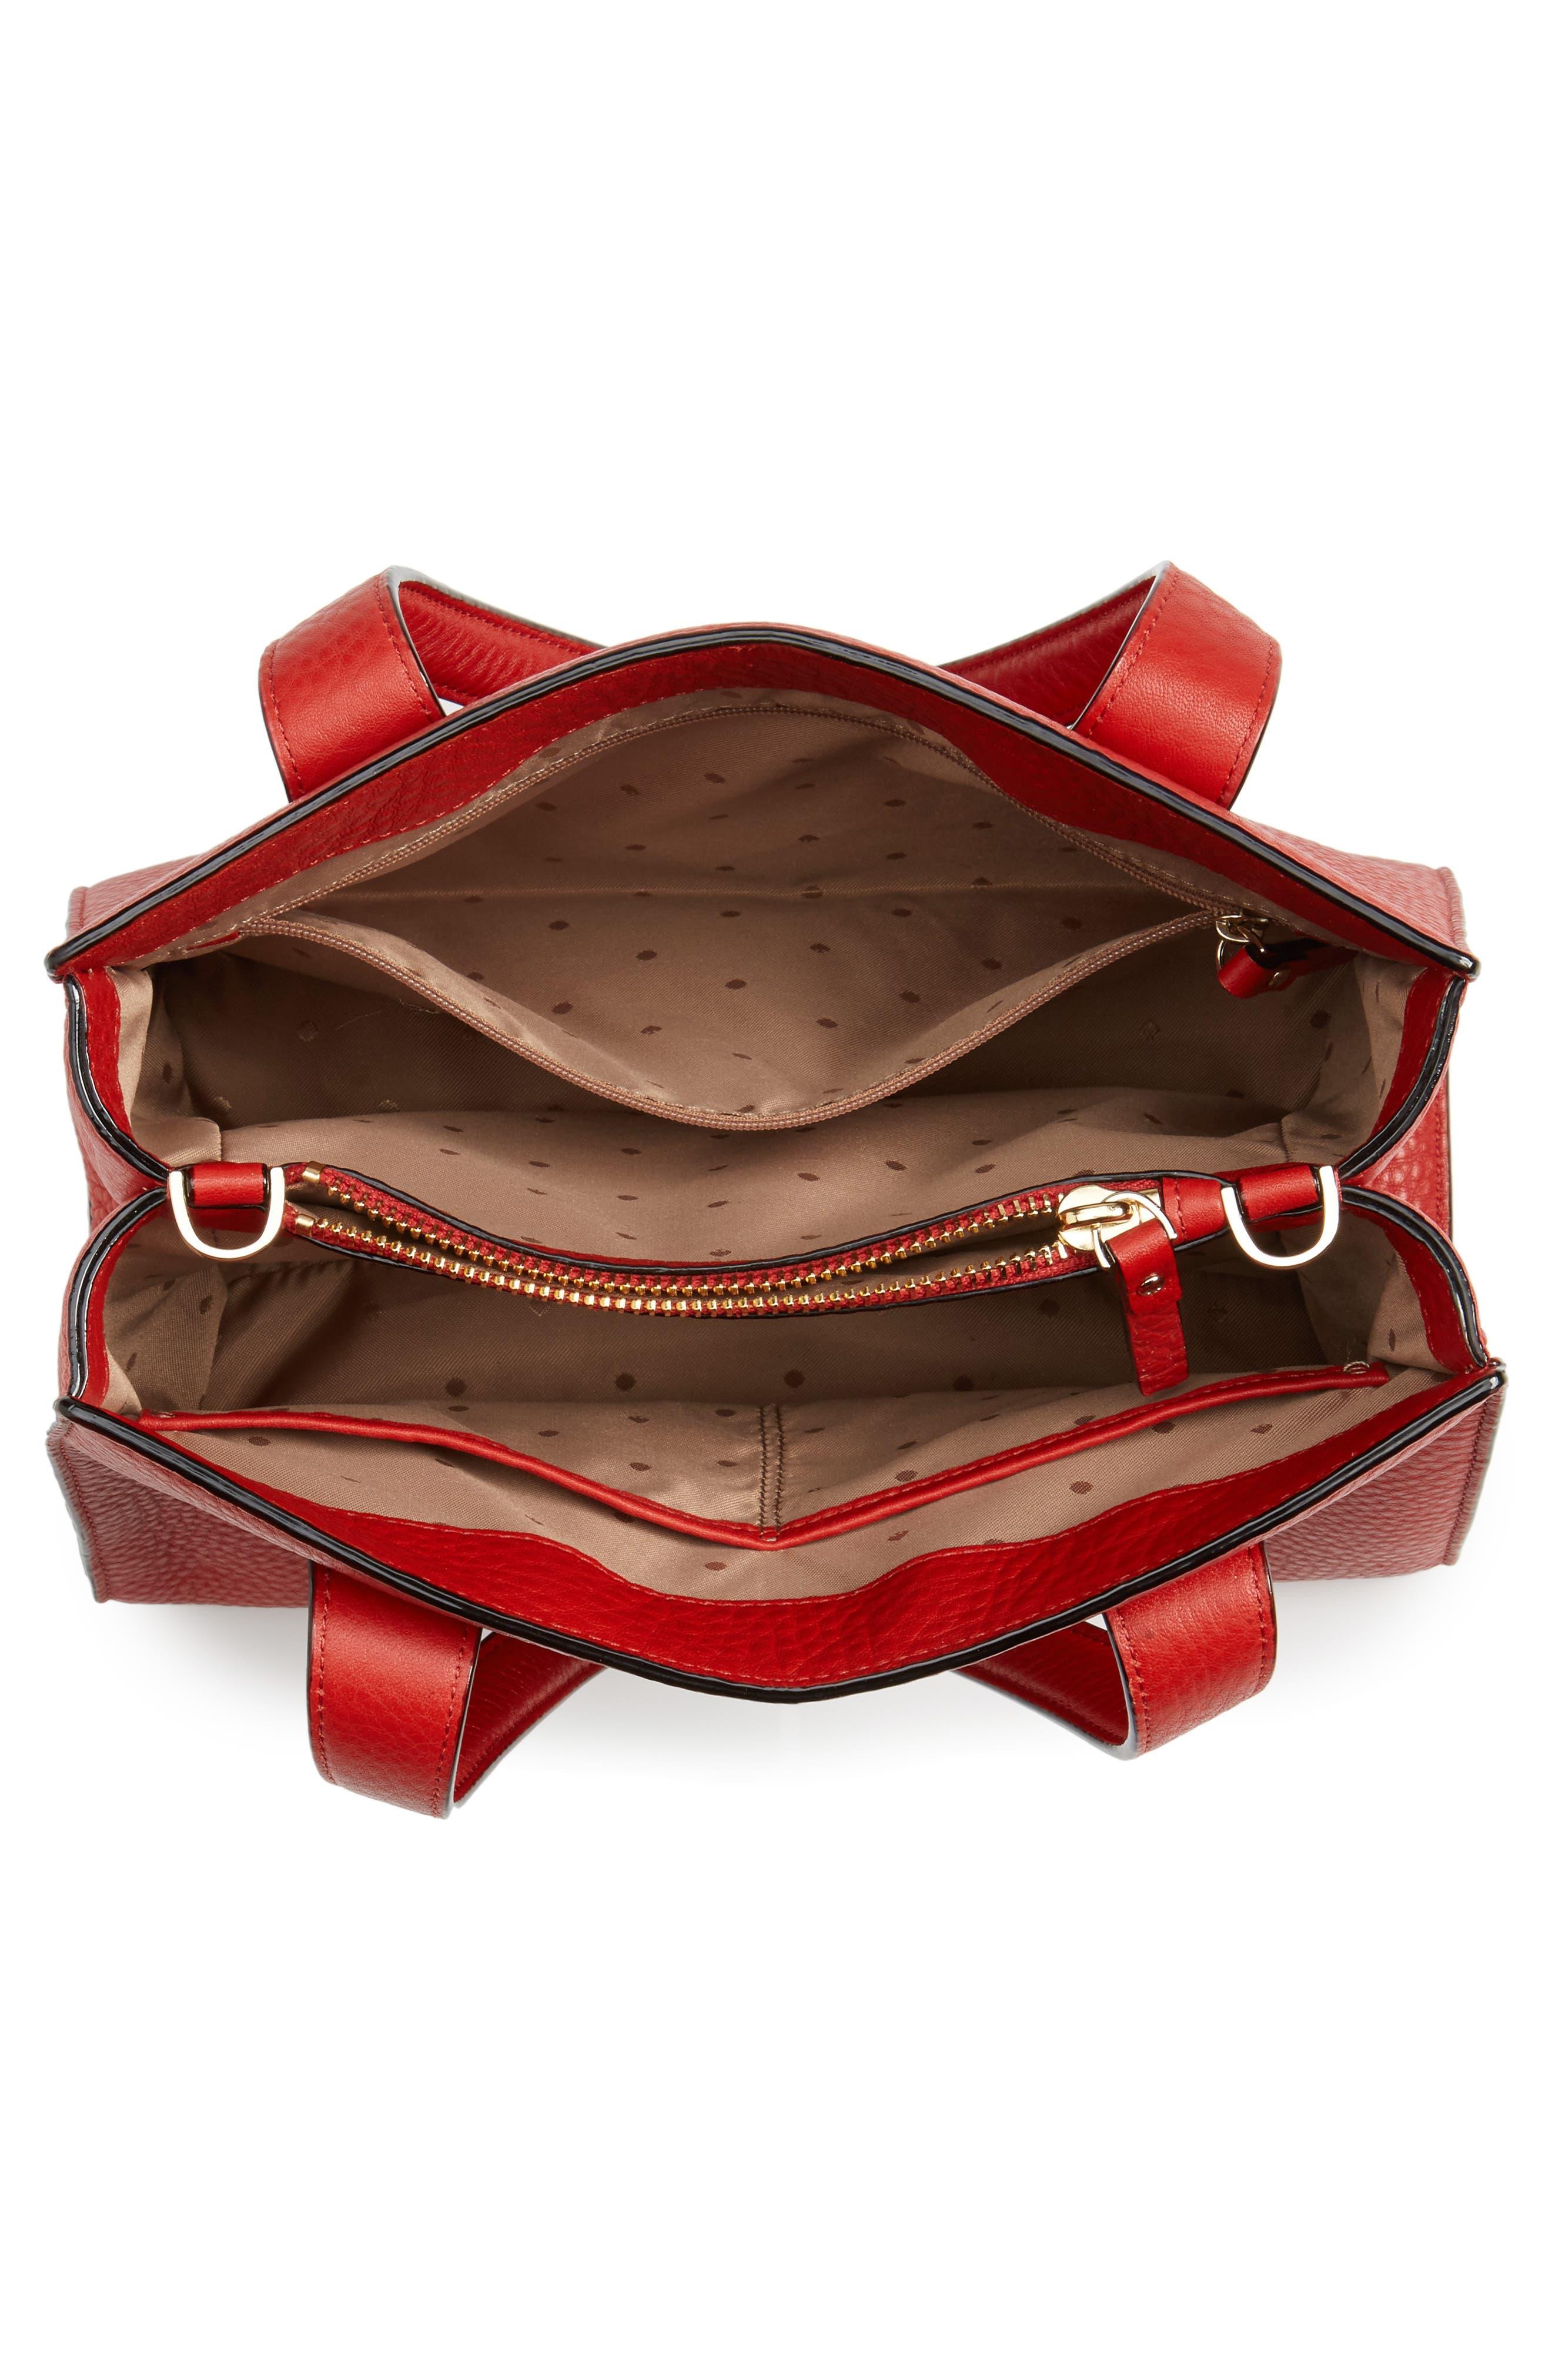 stewart street - little joy leather satchel,                             Alternate thumbnail 3, color,                             631